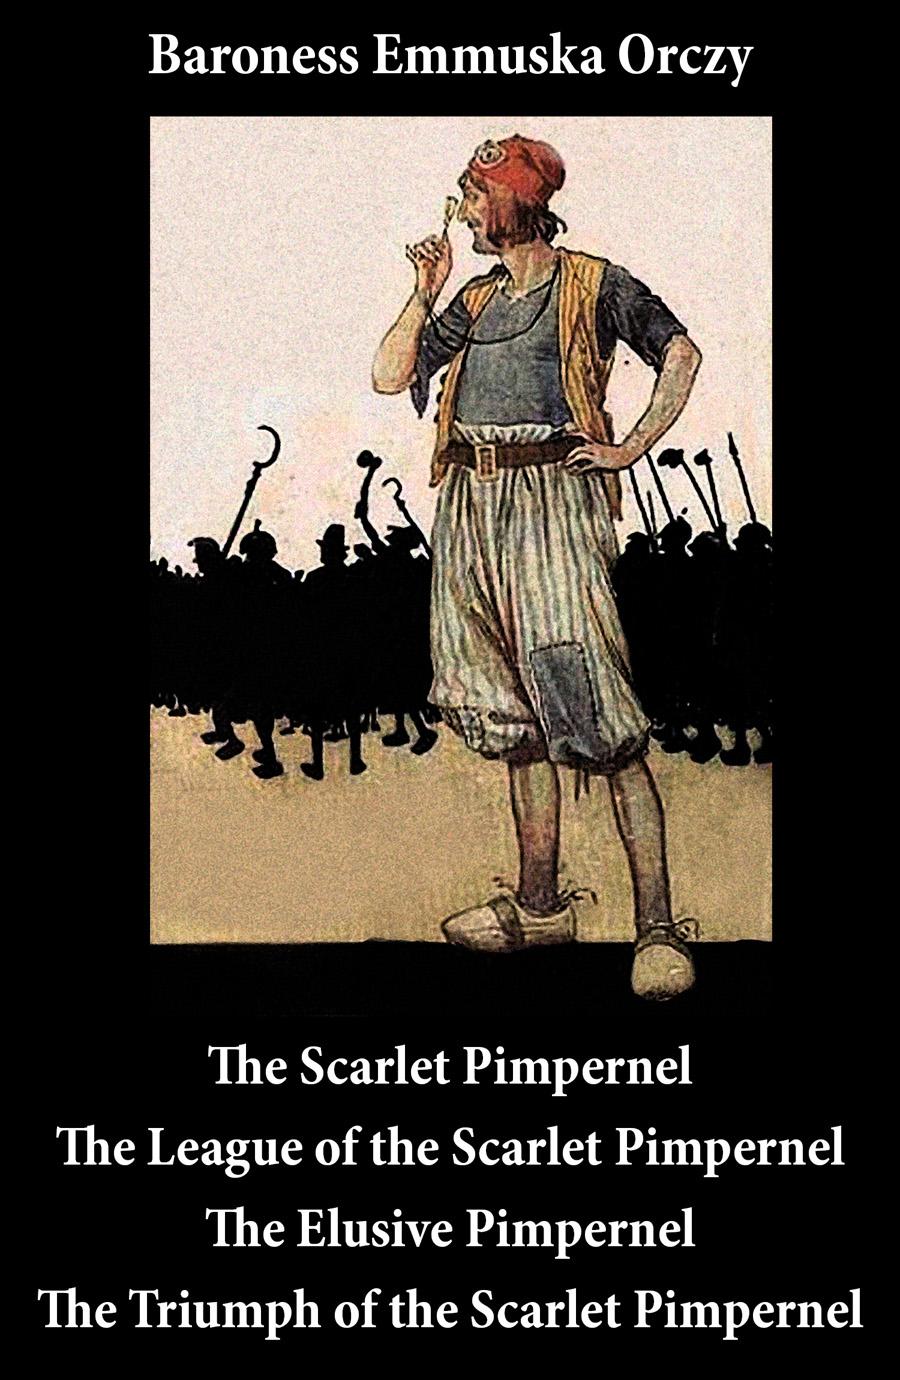 Baroness Emmuska Orczy Scarlet Pimpernel + The League of the Scarlet Pimpernel + The Elusive Pimpernel + The Triumph of the Scarlet Pimpernel (4 Unabridged Classics) nancy drew 32 the scarlet slipper mystery